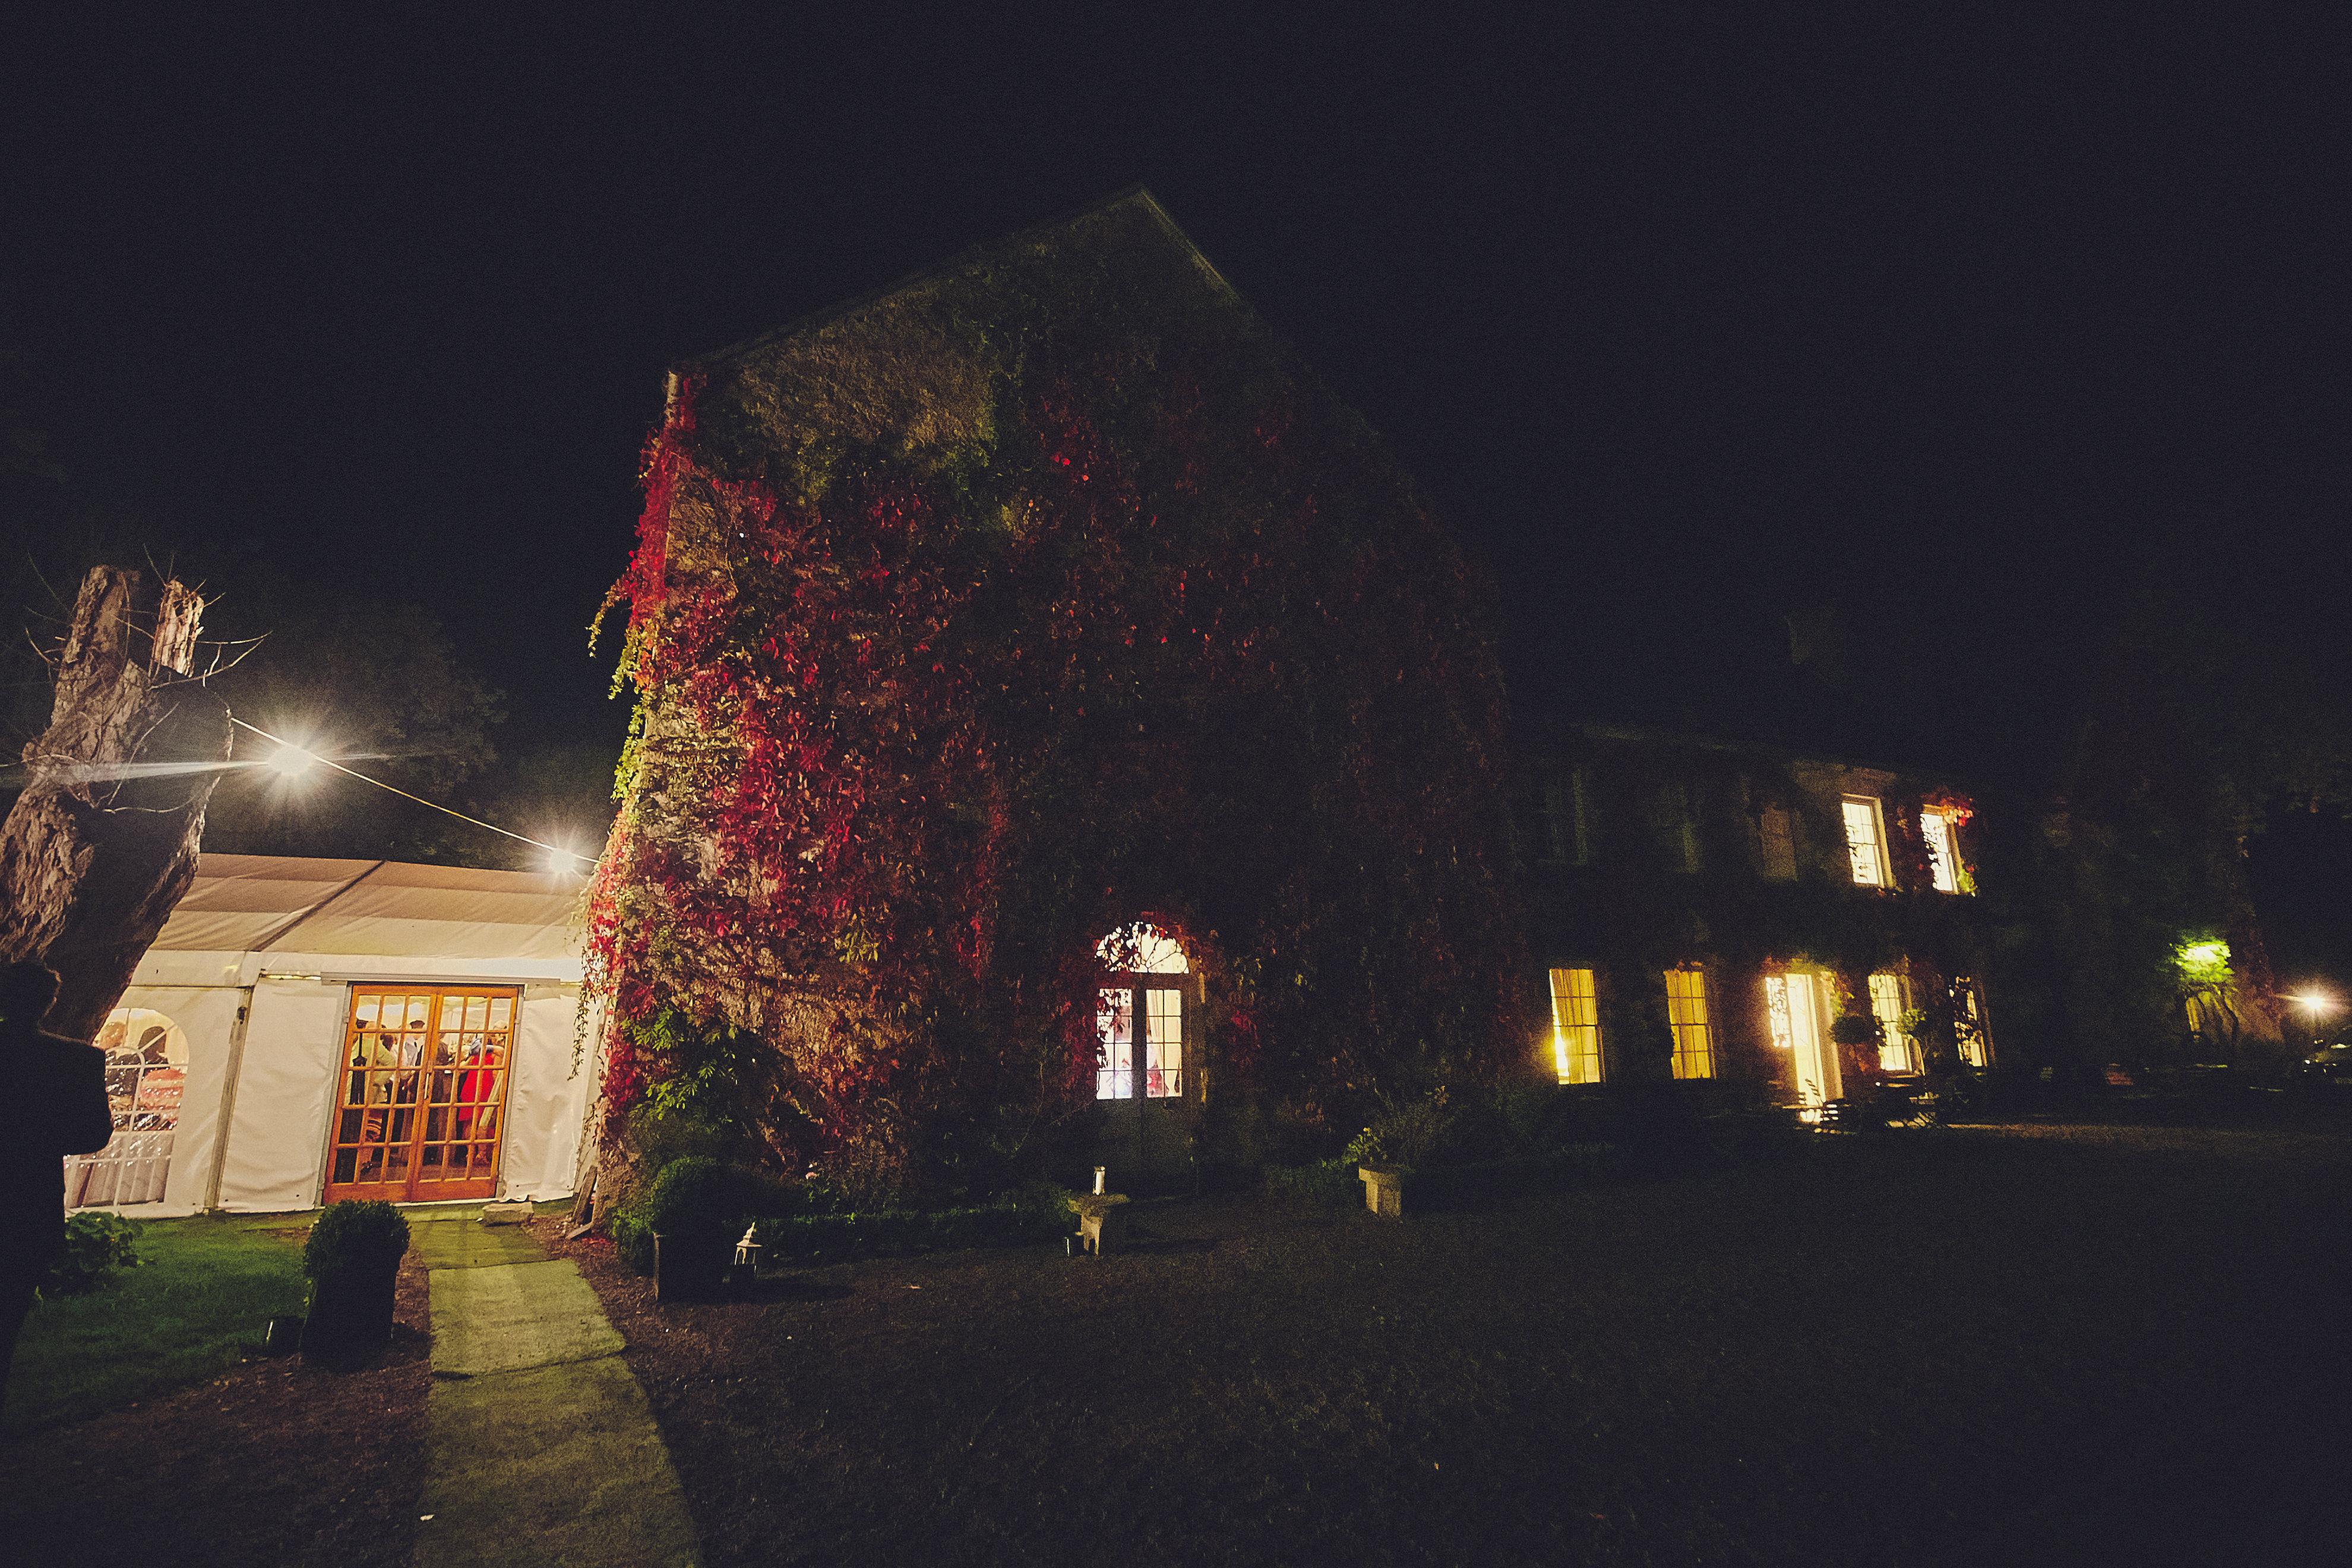 Cloughjordan House weddding171 - Cloughjordan House Wedding - Alternative Venue